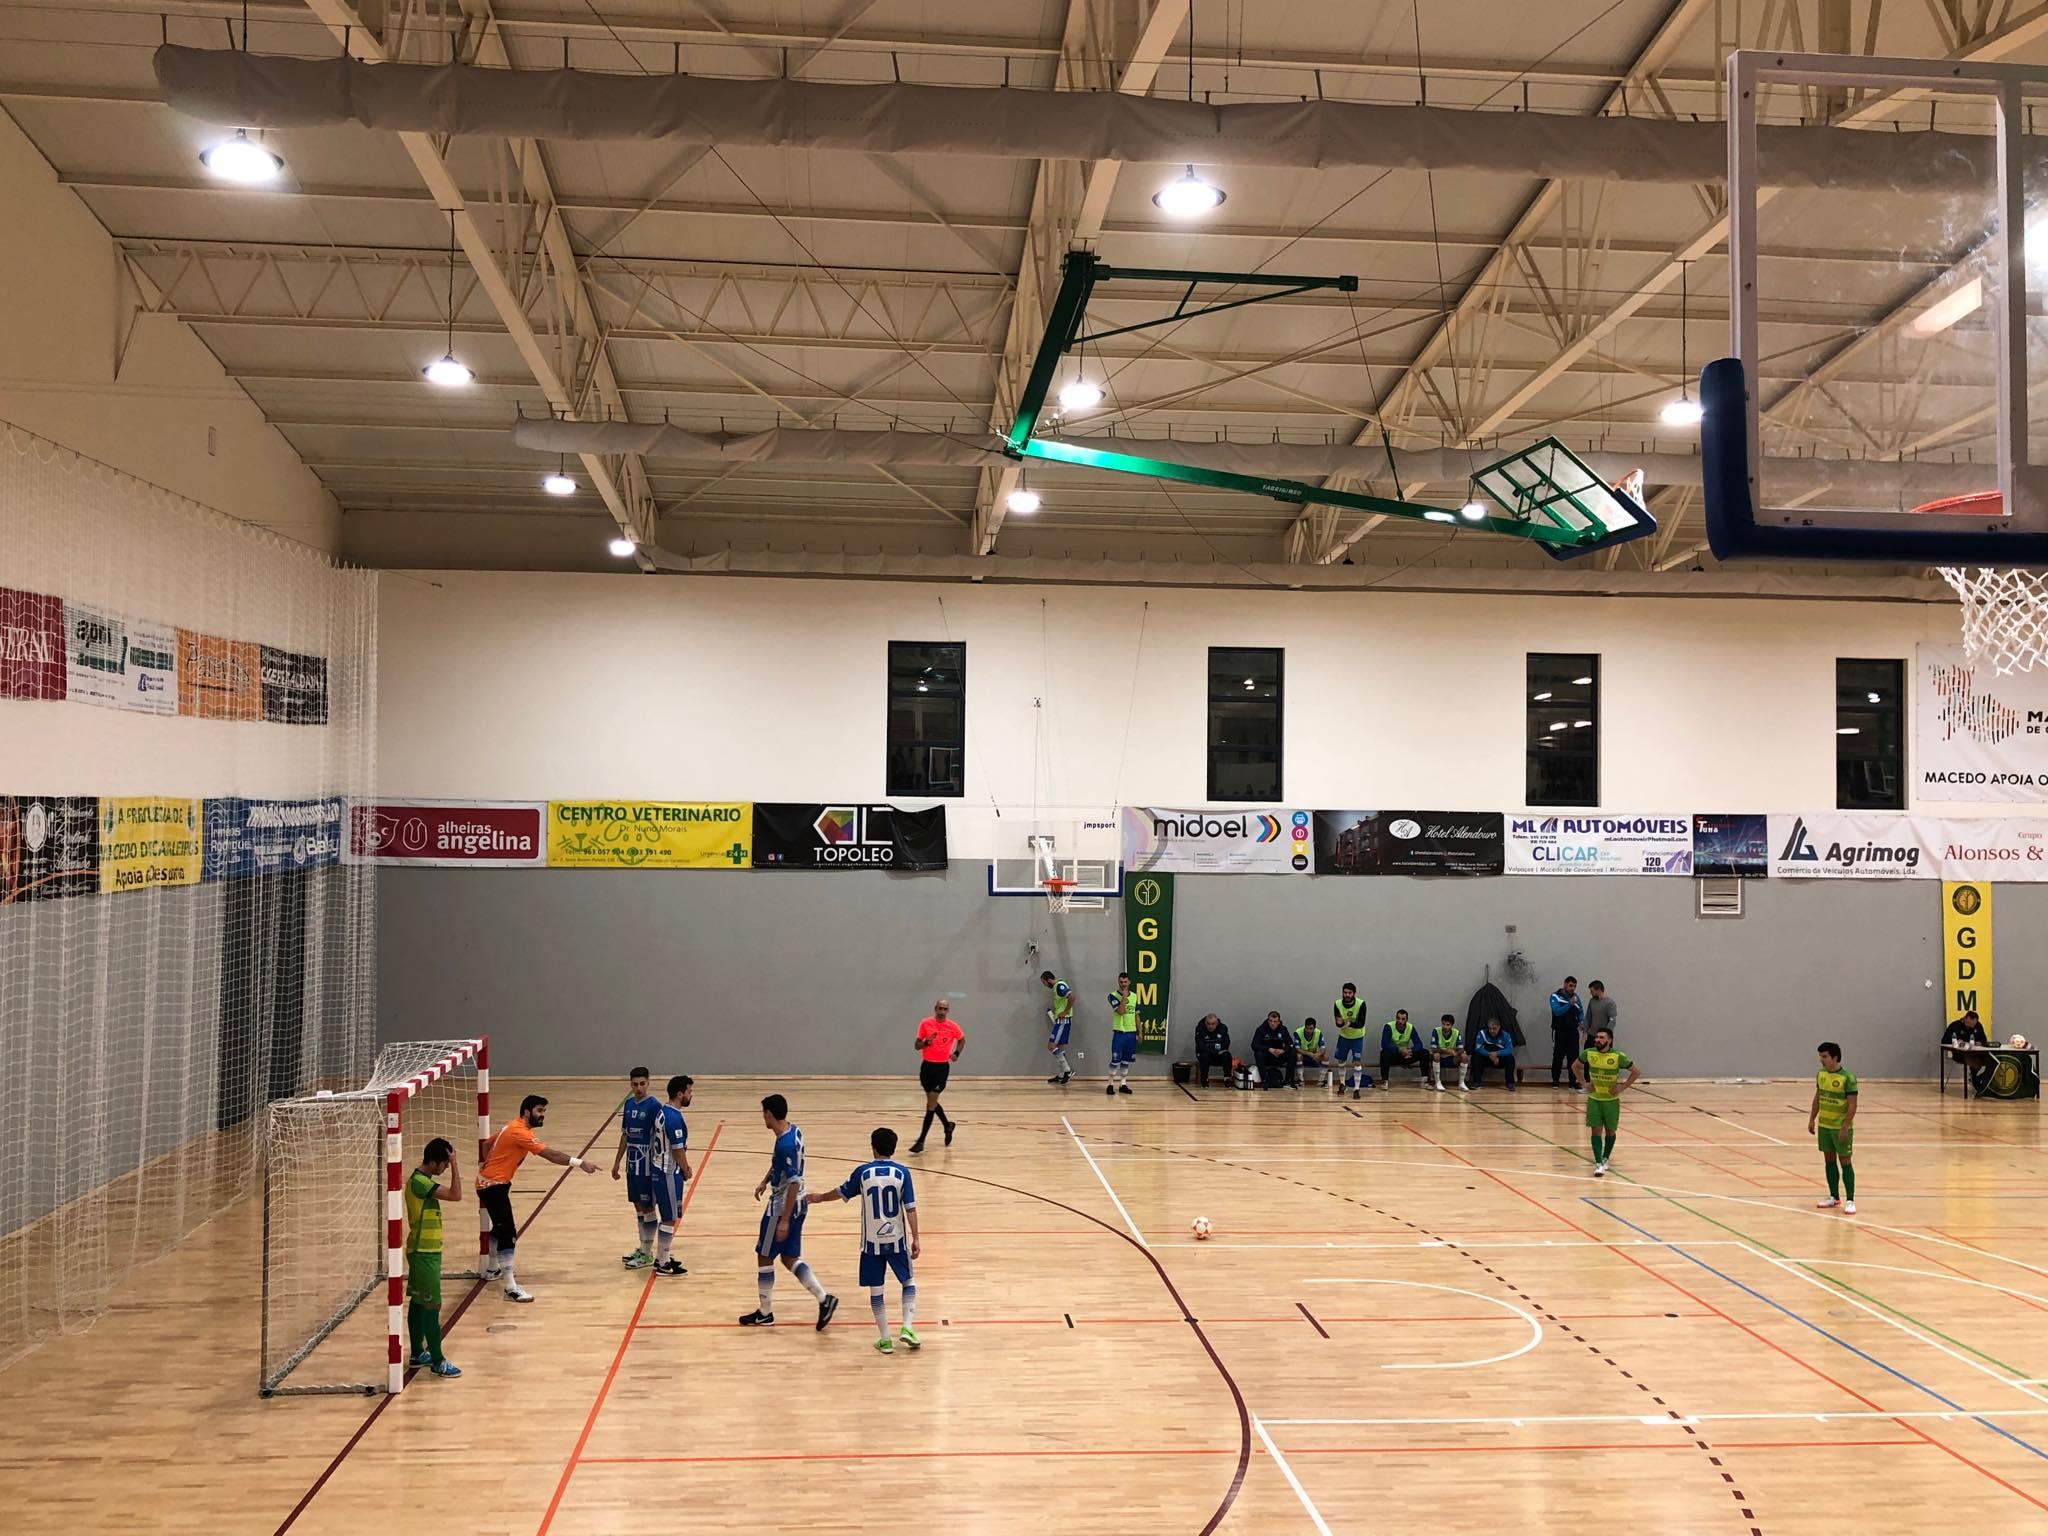 Grupo Desportivo Macedense eliminado da Taça de Portugal de Futsal